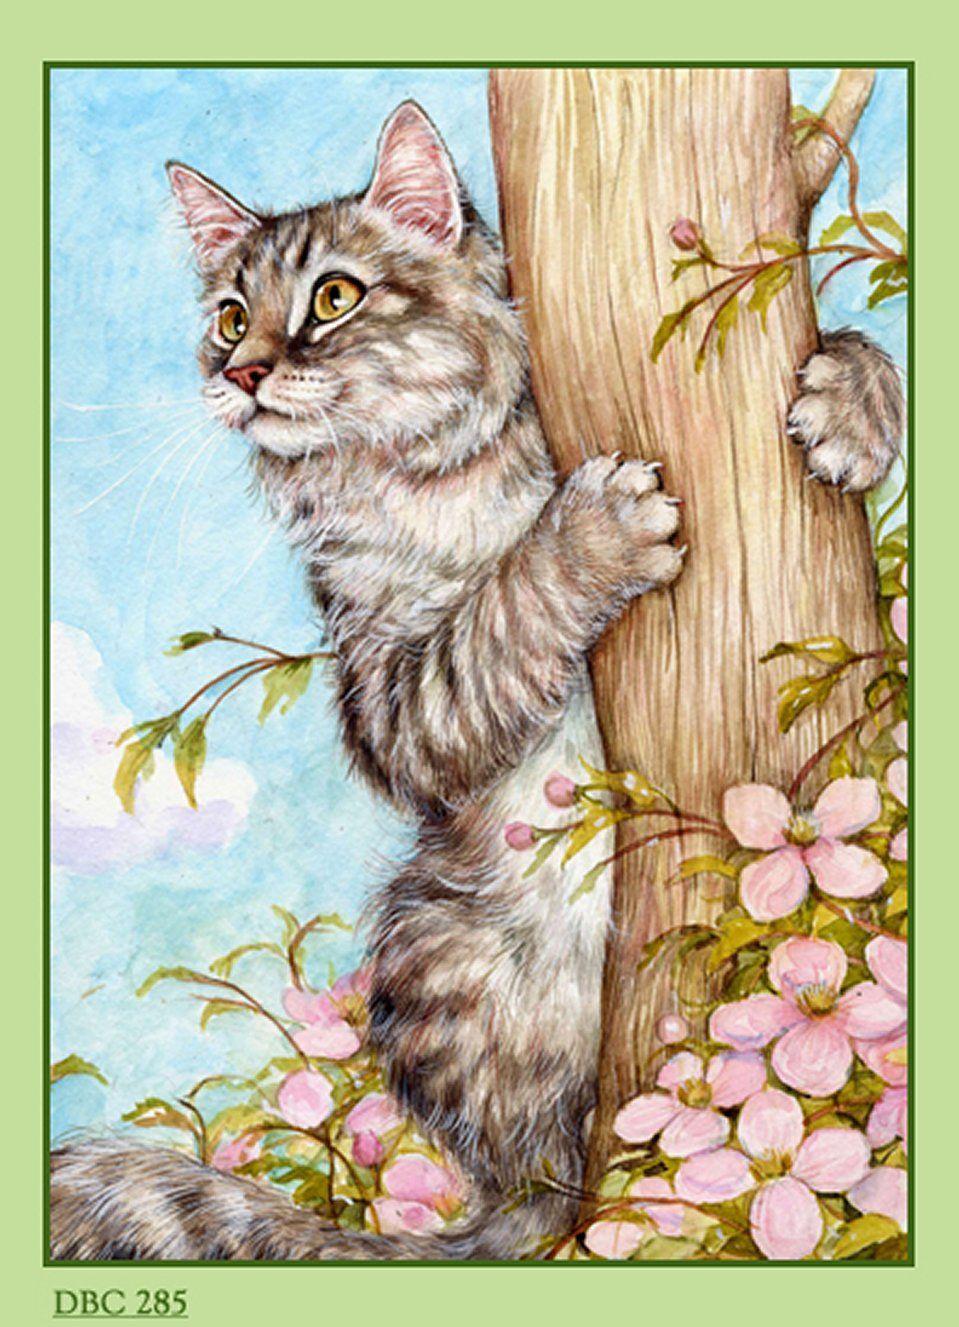 Pin von Rebecca Mohr auf Drawings | Pinterest | Katzen, Katzenbilder ...